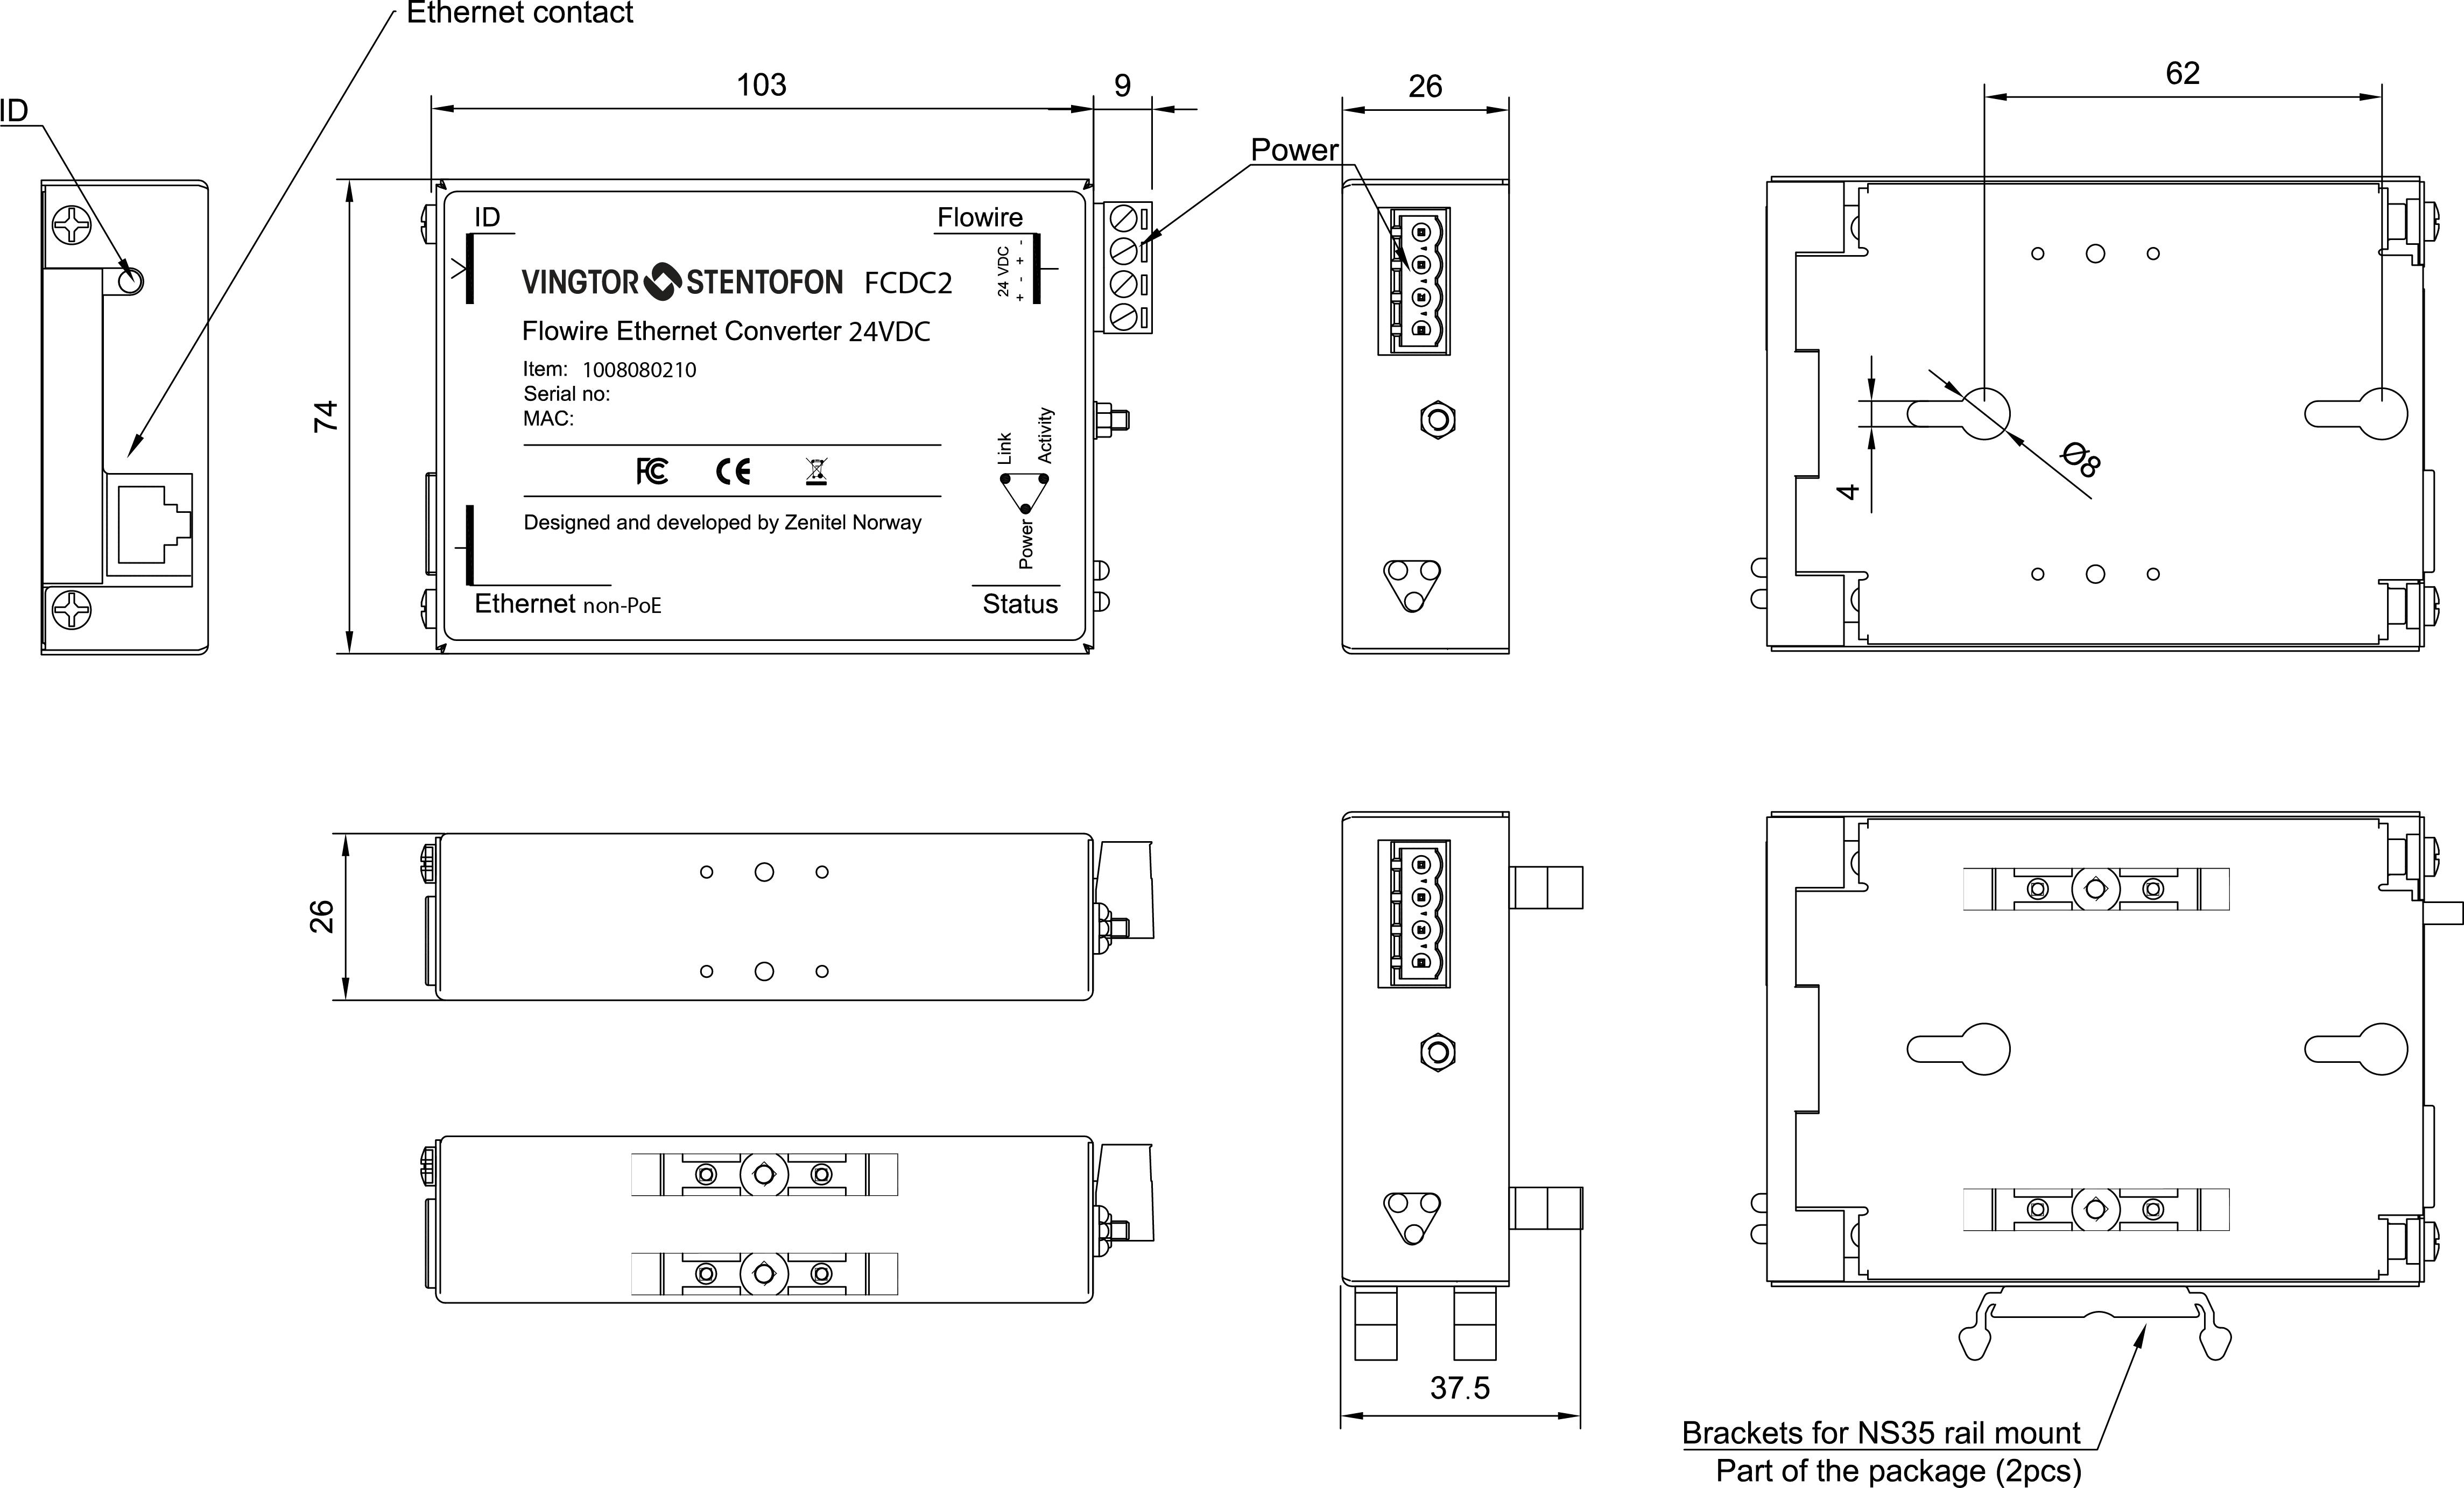 FCDC2_1008080210_Flowire_Ethernet_Converter fcdc2 zenitel stentofon wiring diagrams at eliteediting.co